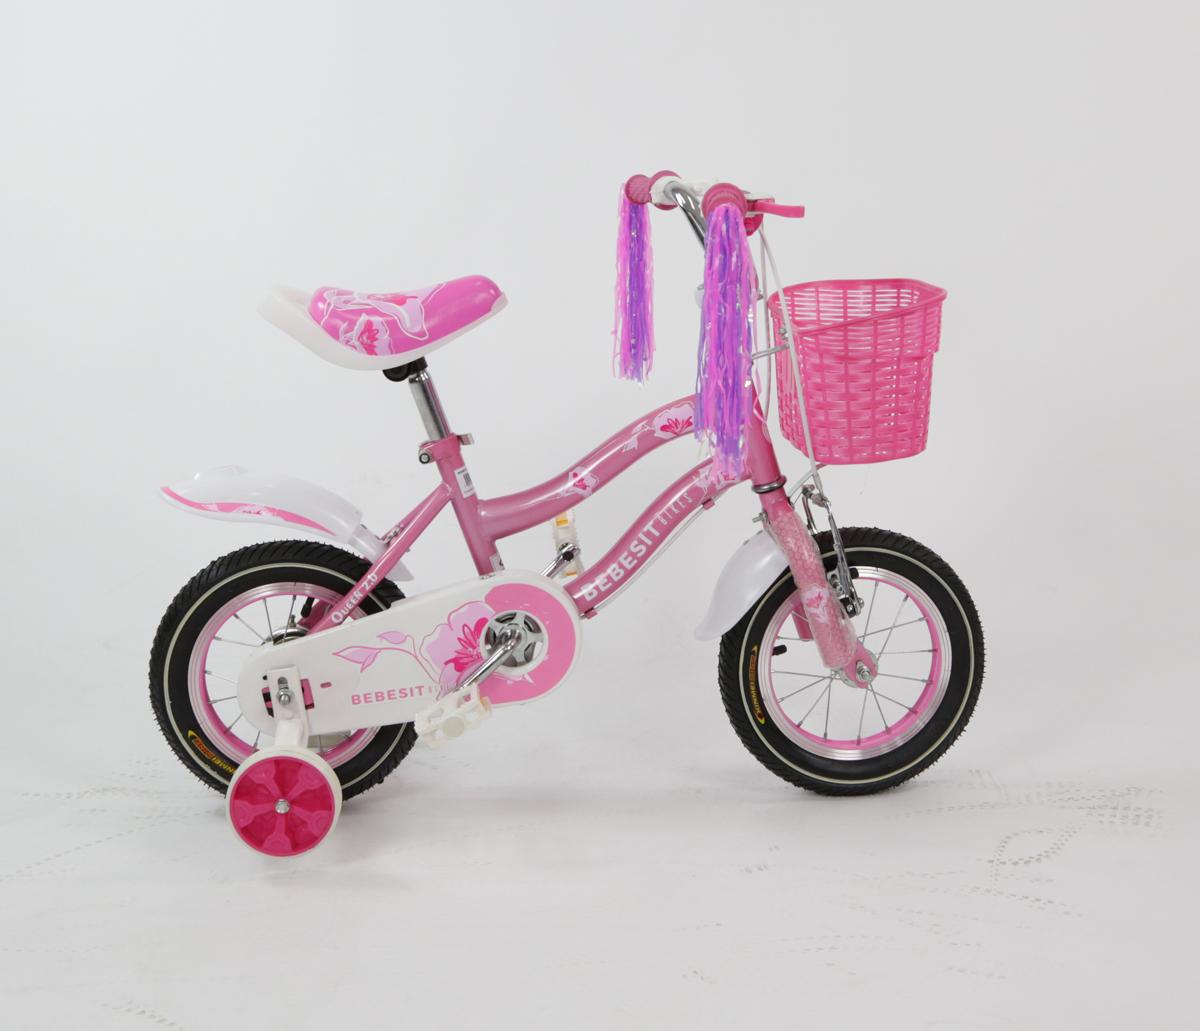 BEBESIT Bicicleta Queen rodado 12